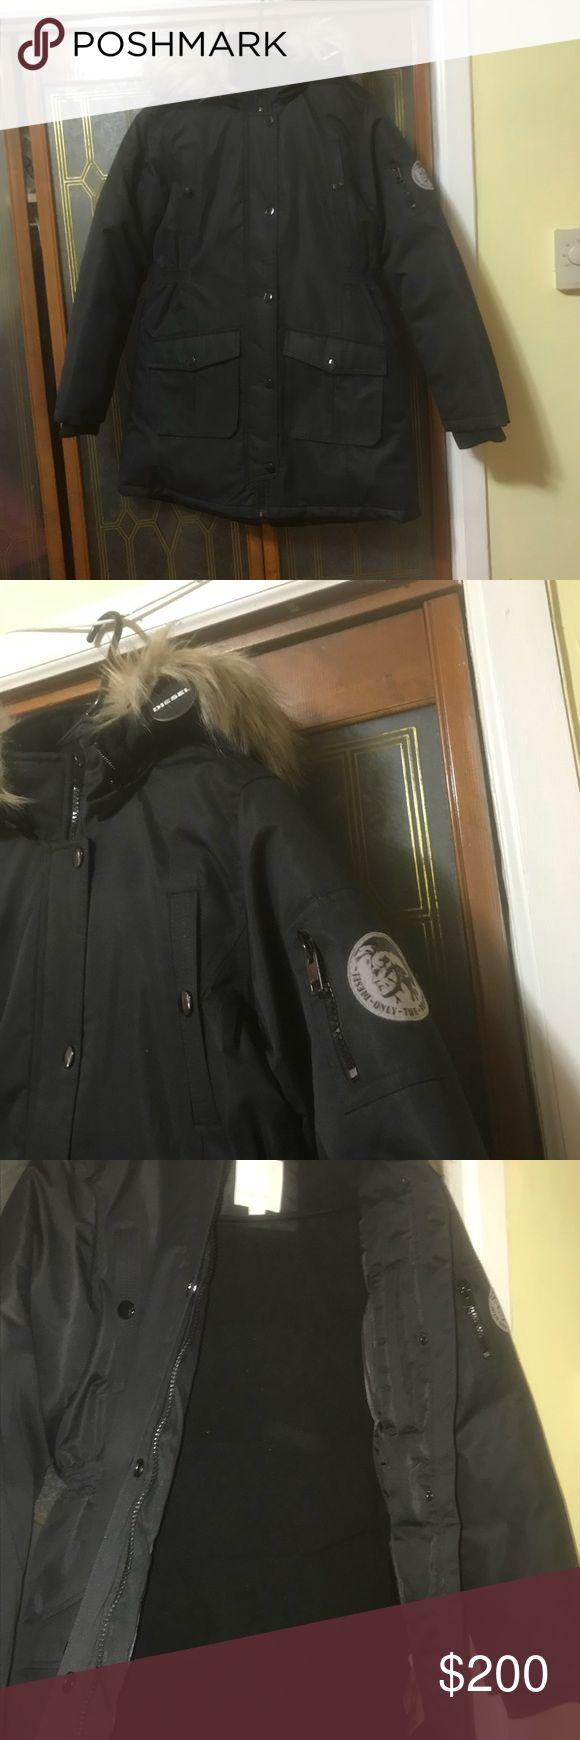 Diesel Boys Diesel coat with detachable hood, hidden inner pocket super warm coat with faux fur hooded trim size with back bottom zipper ,14/16 Diesel Jackets & Coats